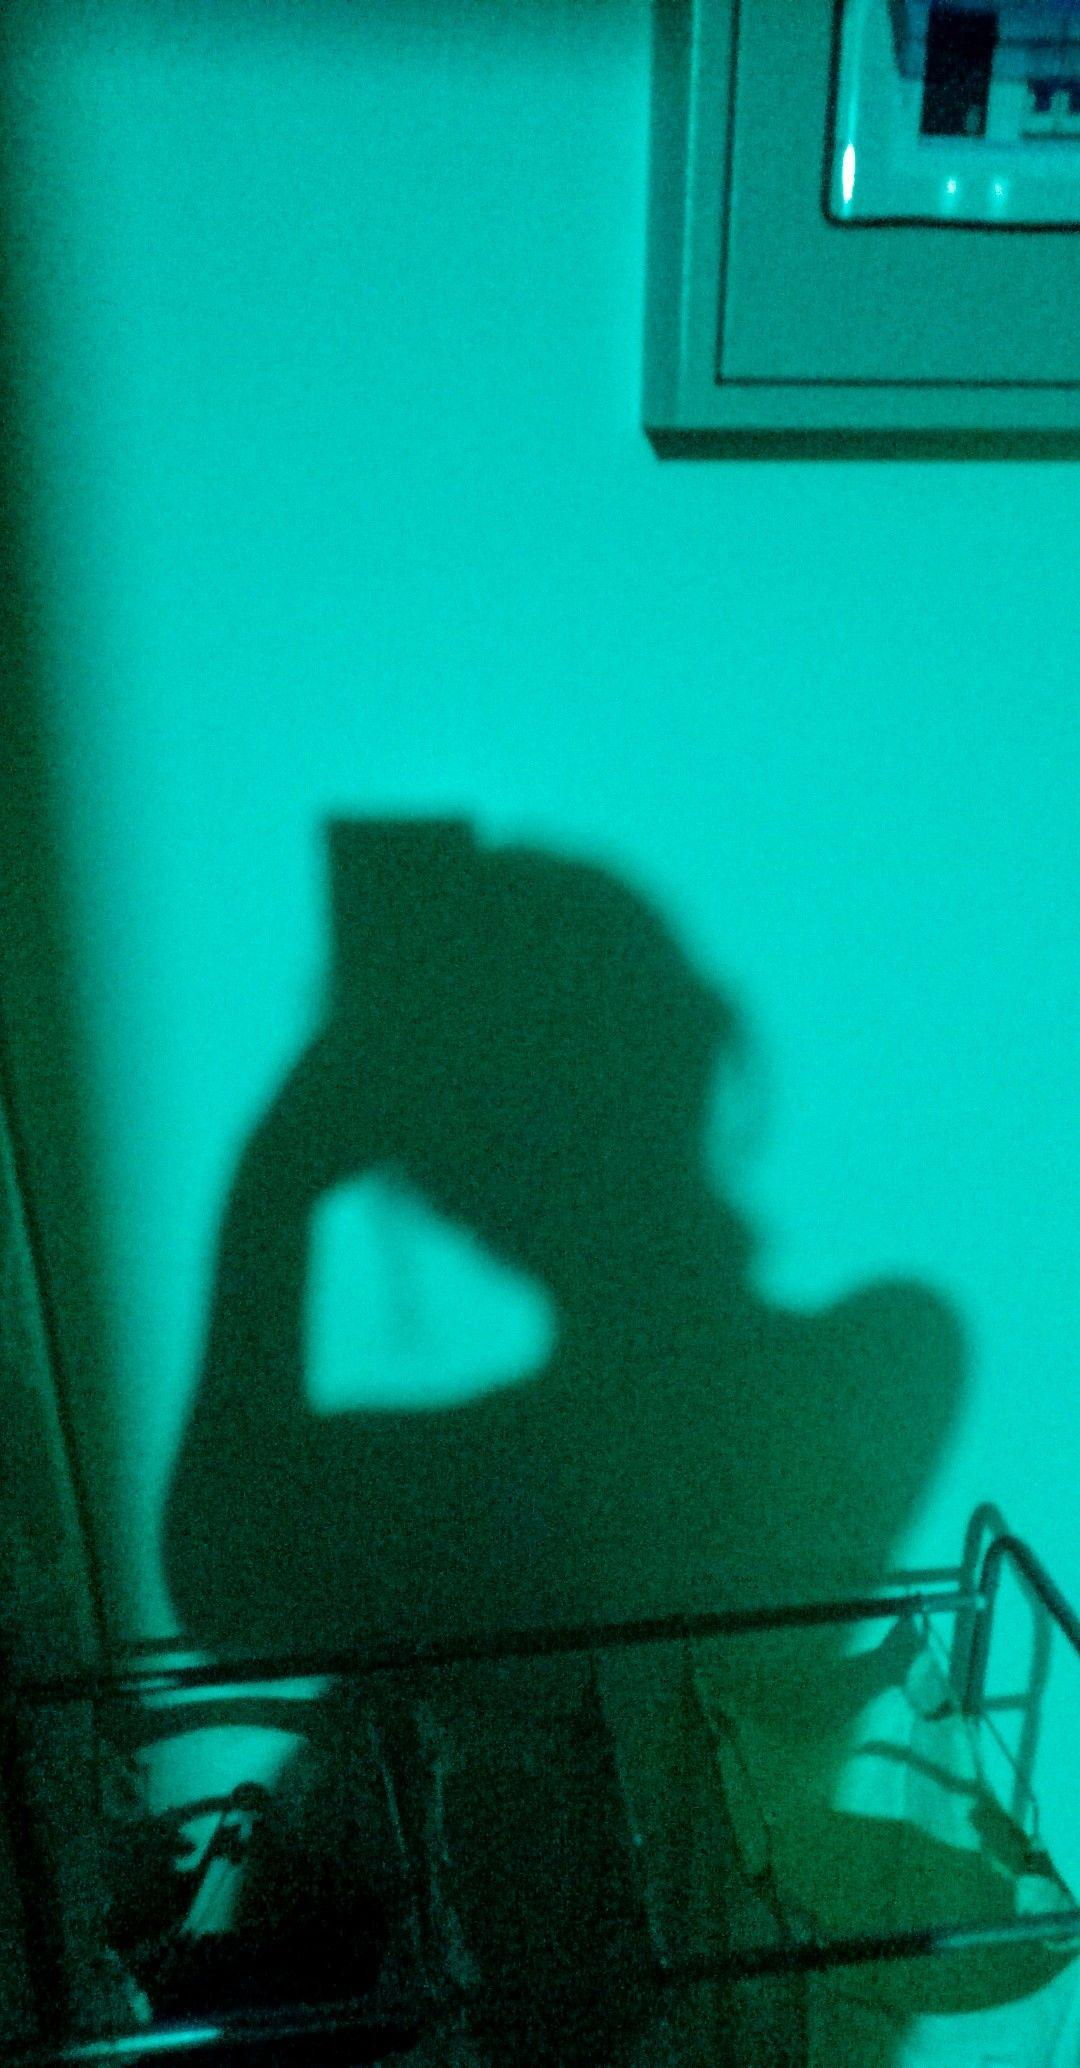 Dark aesthetic green shadow   Green aesthetic, Dark green ...